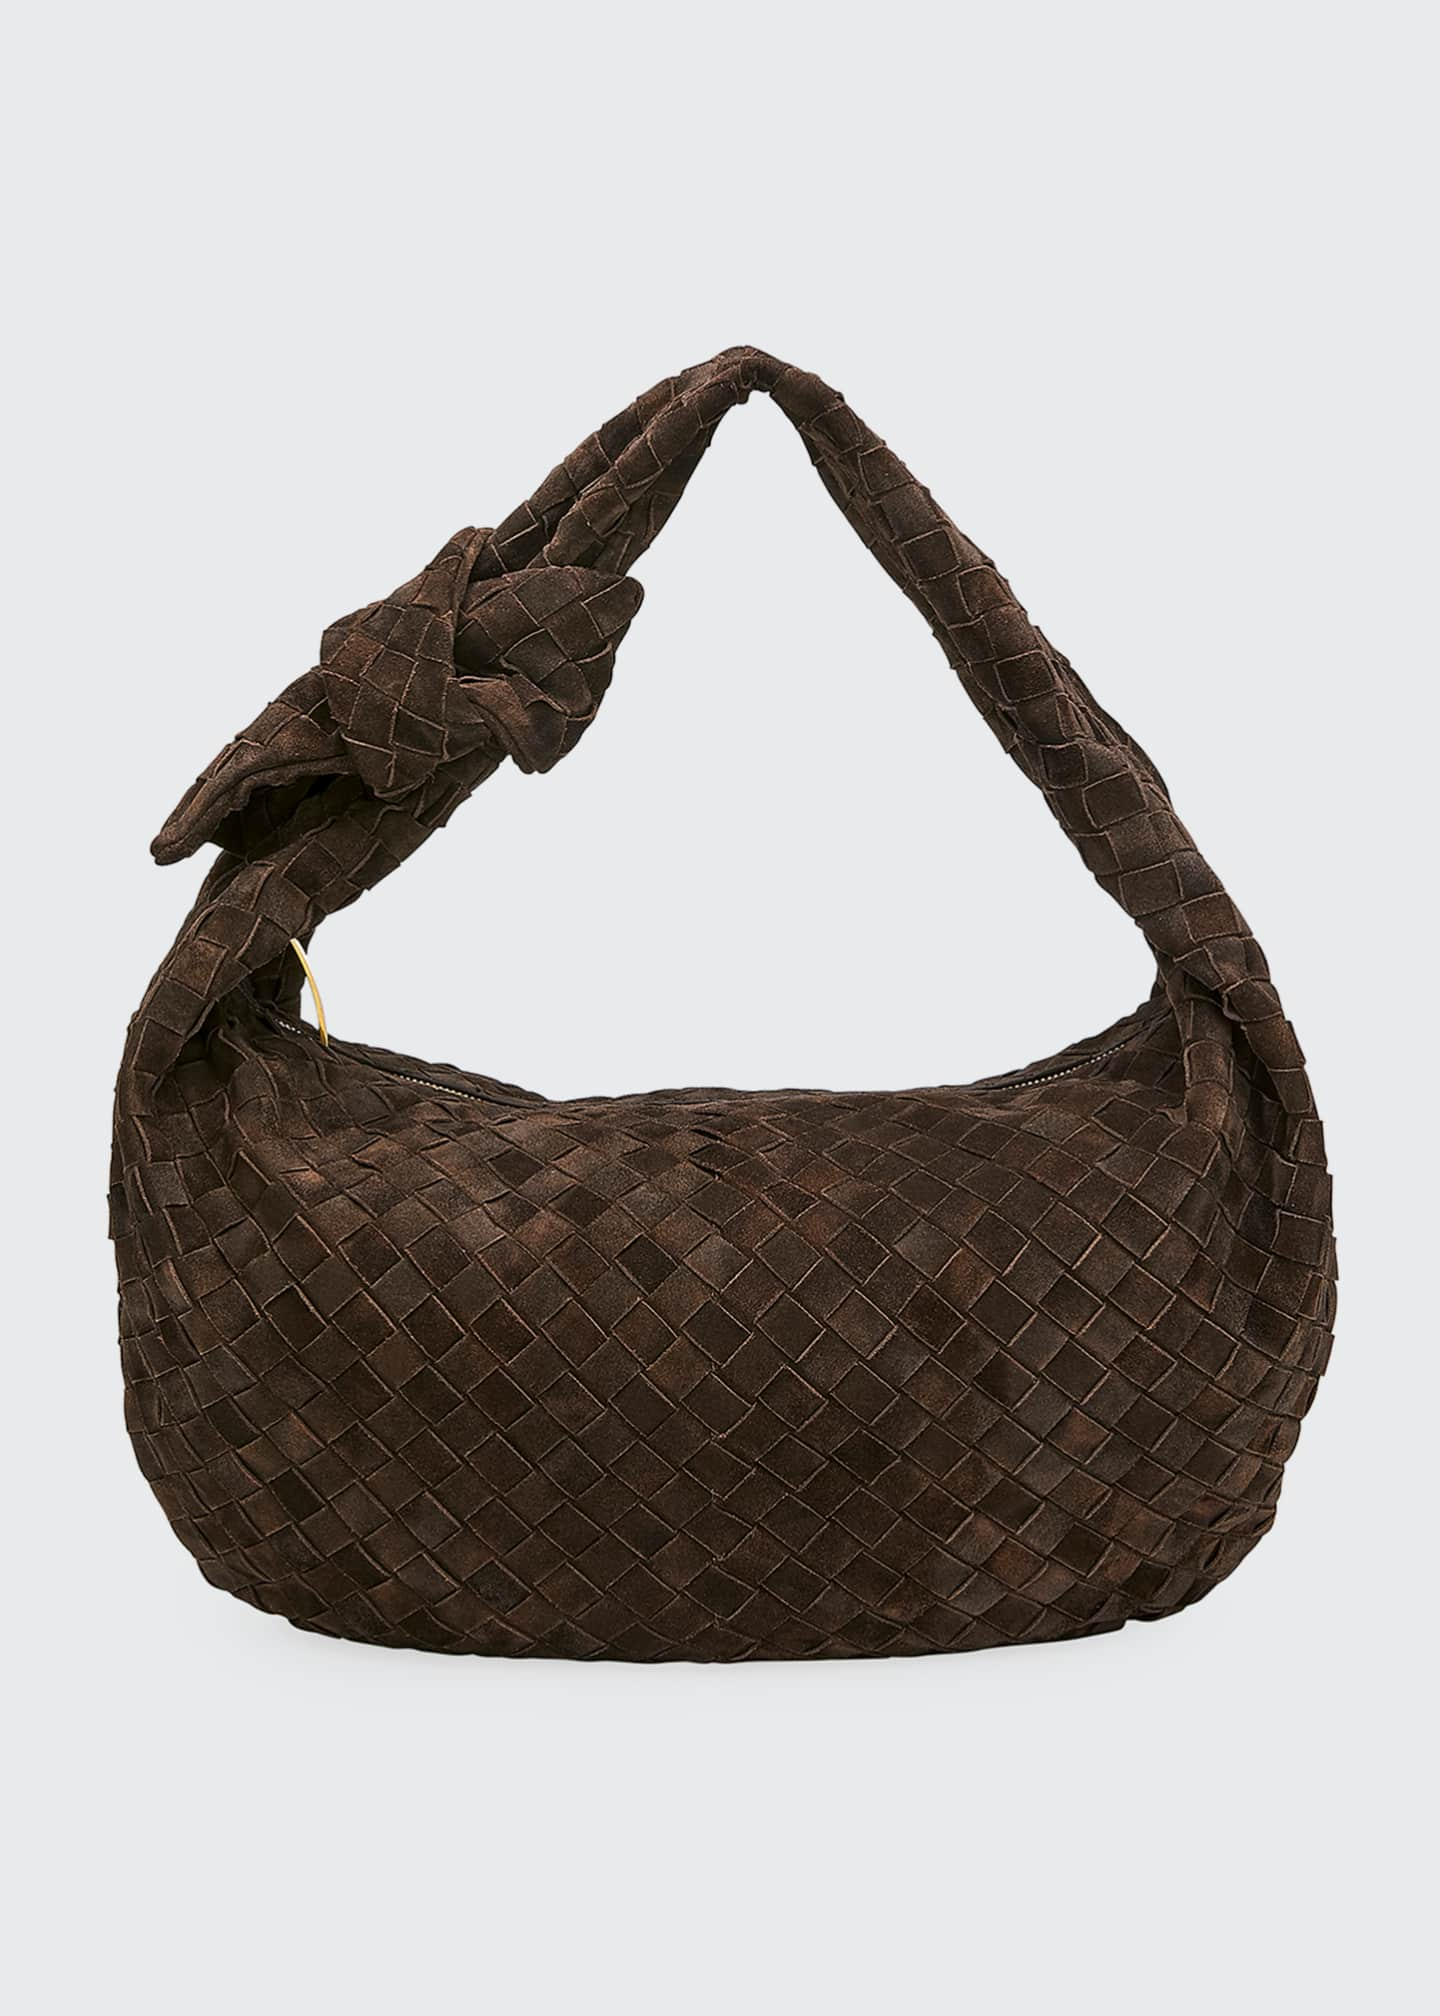 Bottega Veneta Small Intrecciato Cloudy Suede Hobo Bag